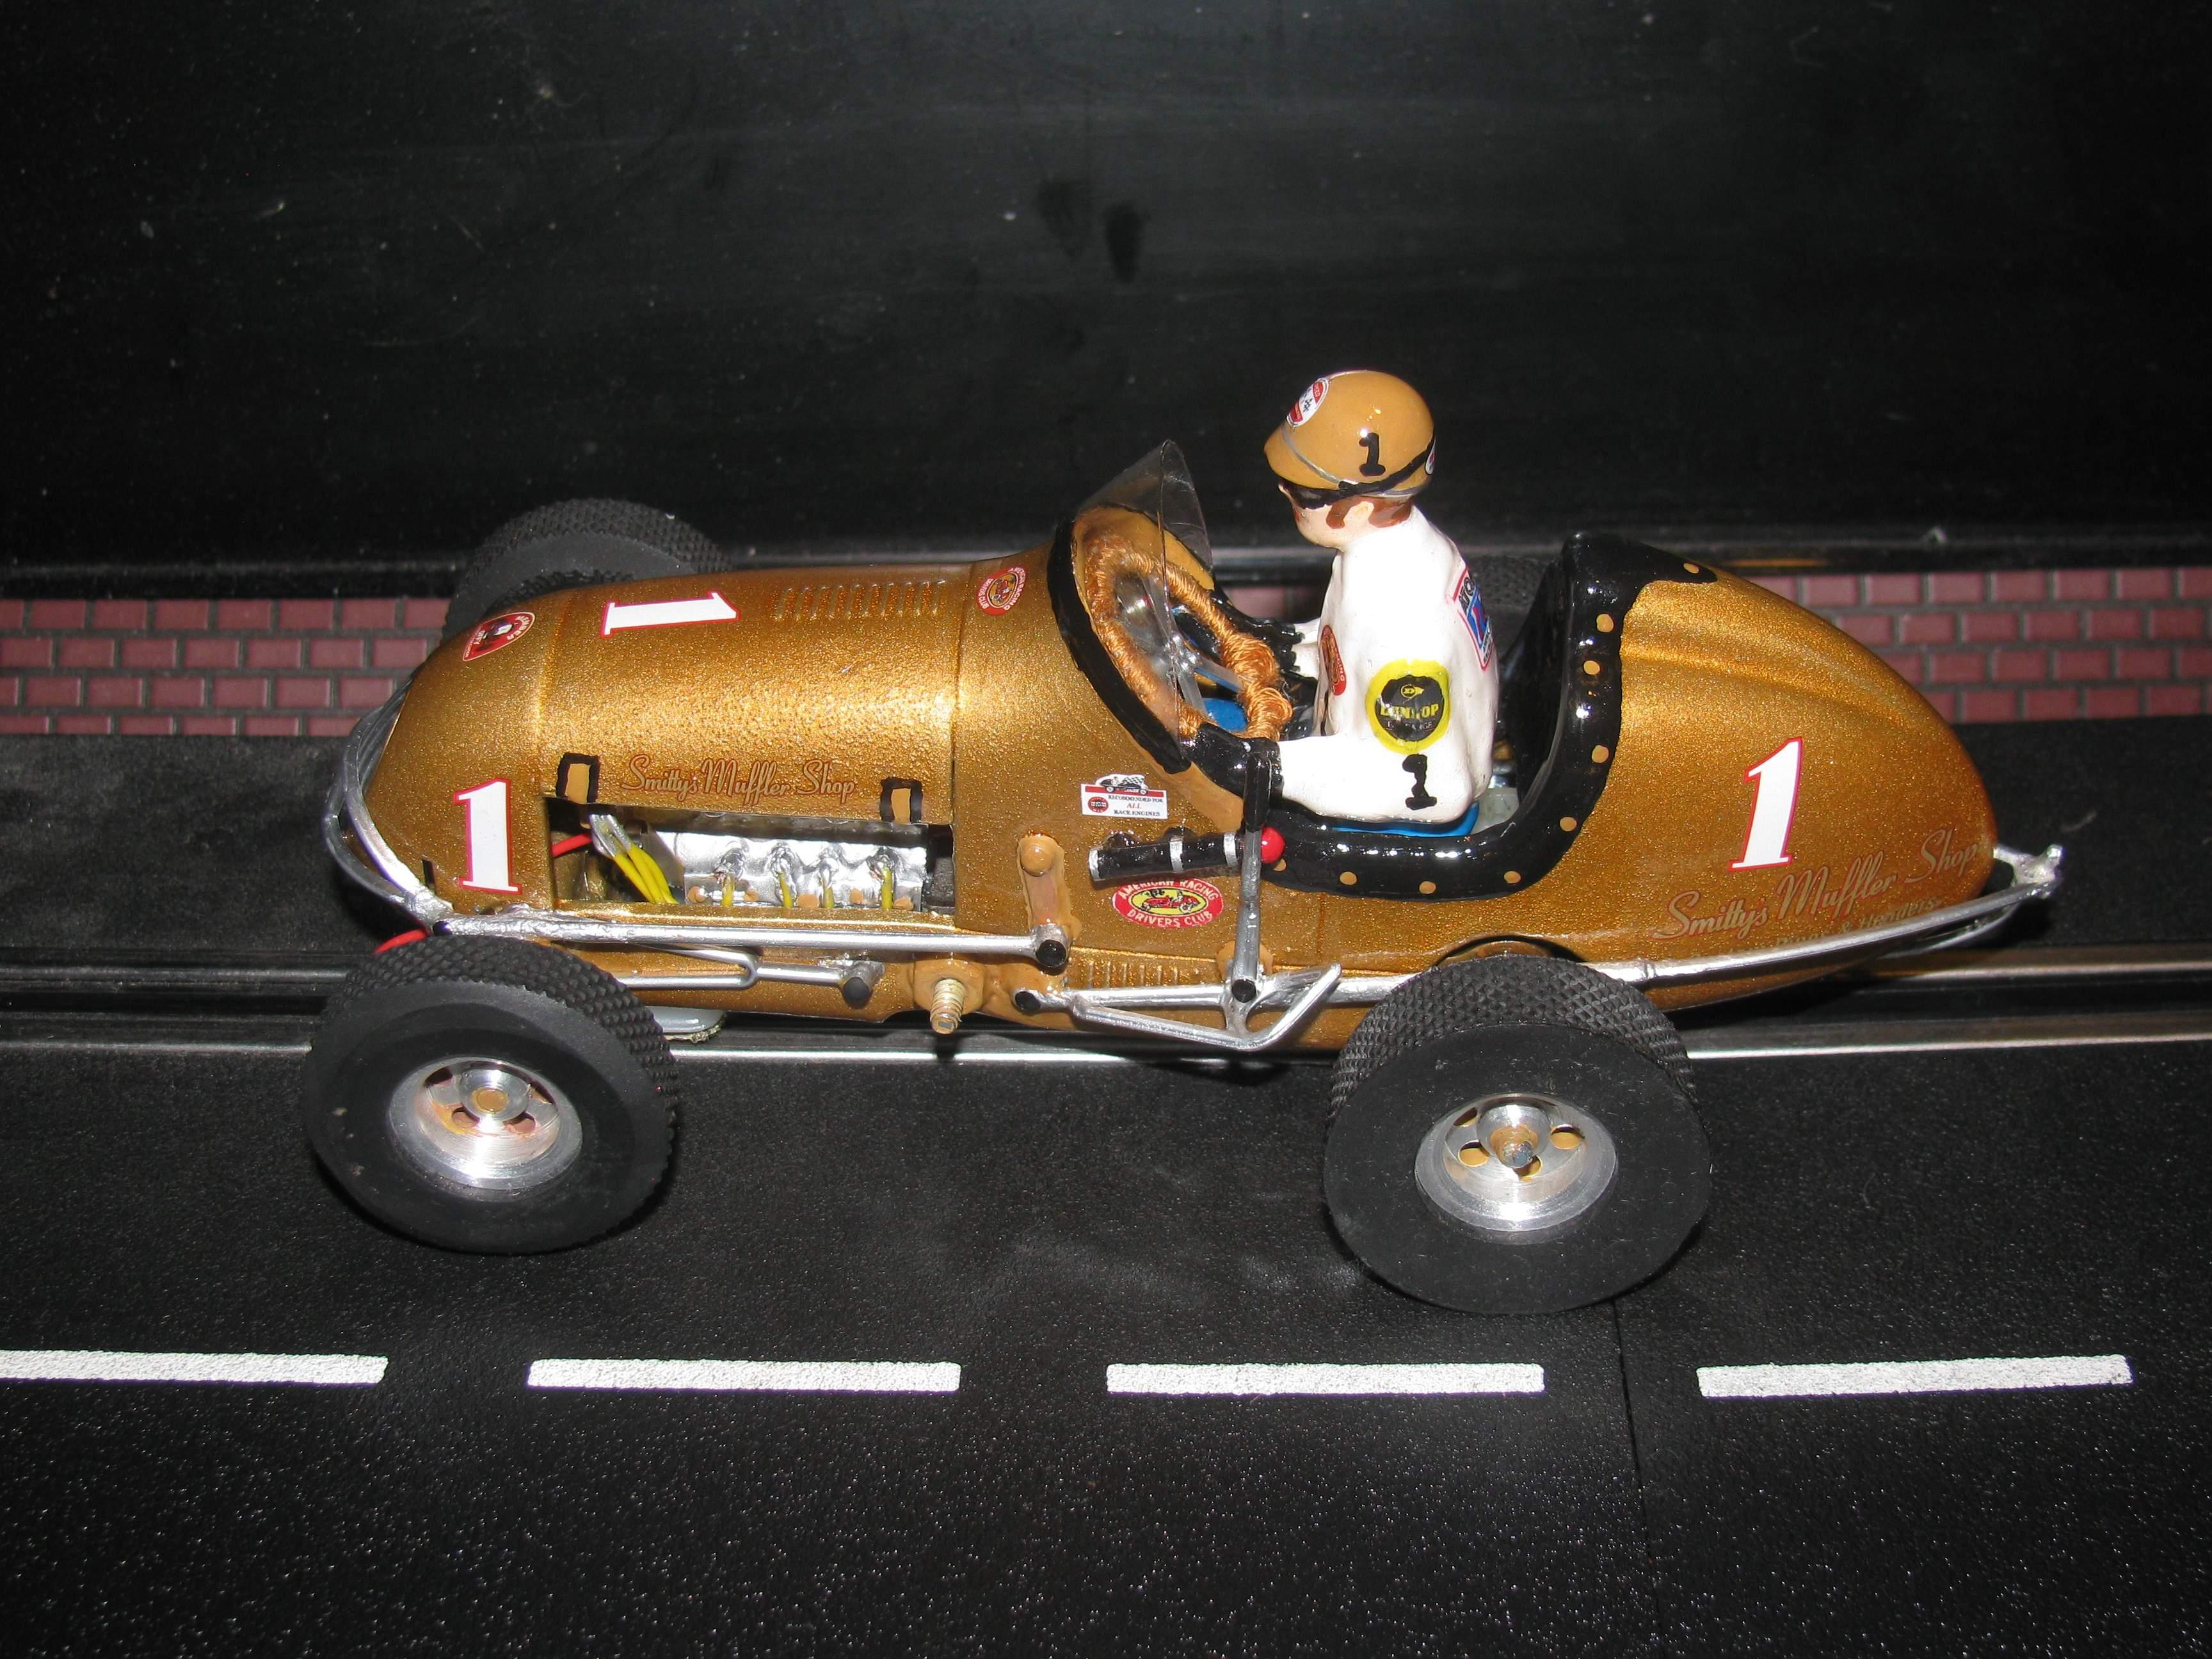 * SOLD * * SALE ENDS SUNDAY * Monogram Midget Racer Golden Ticket Racing Special Car 1 1:24 Scale Slot Car